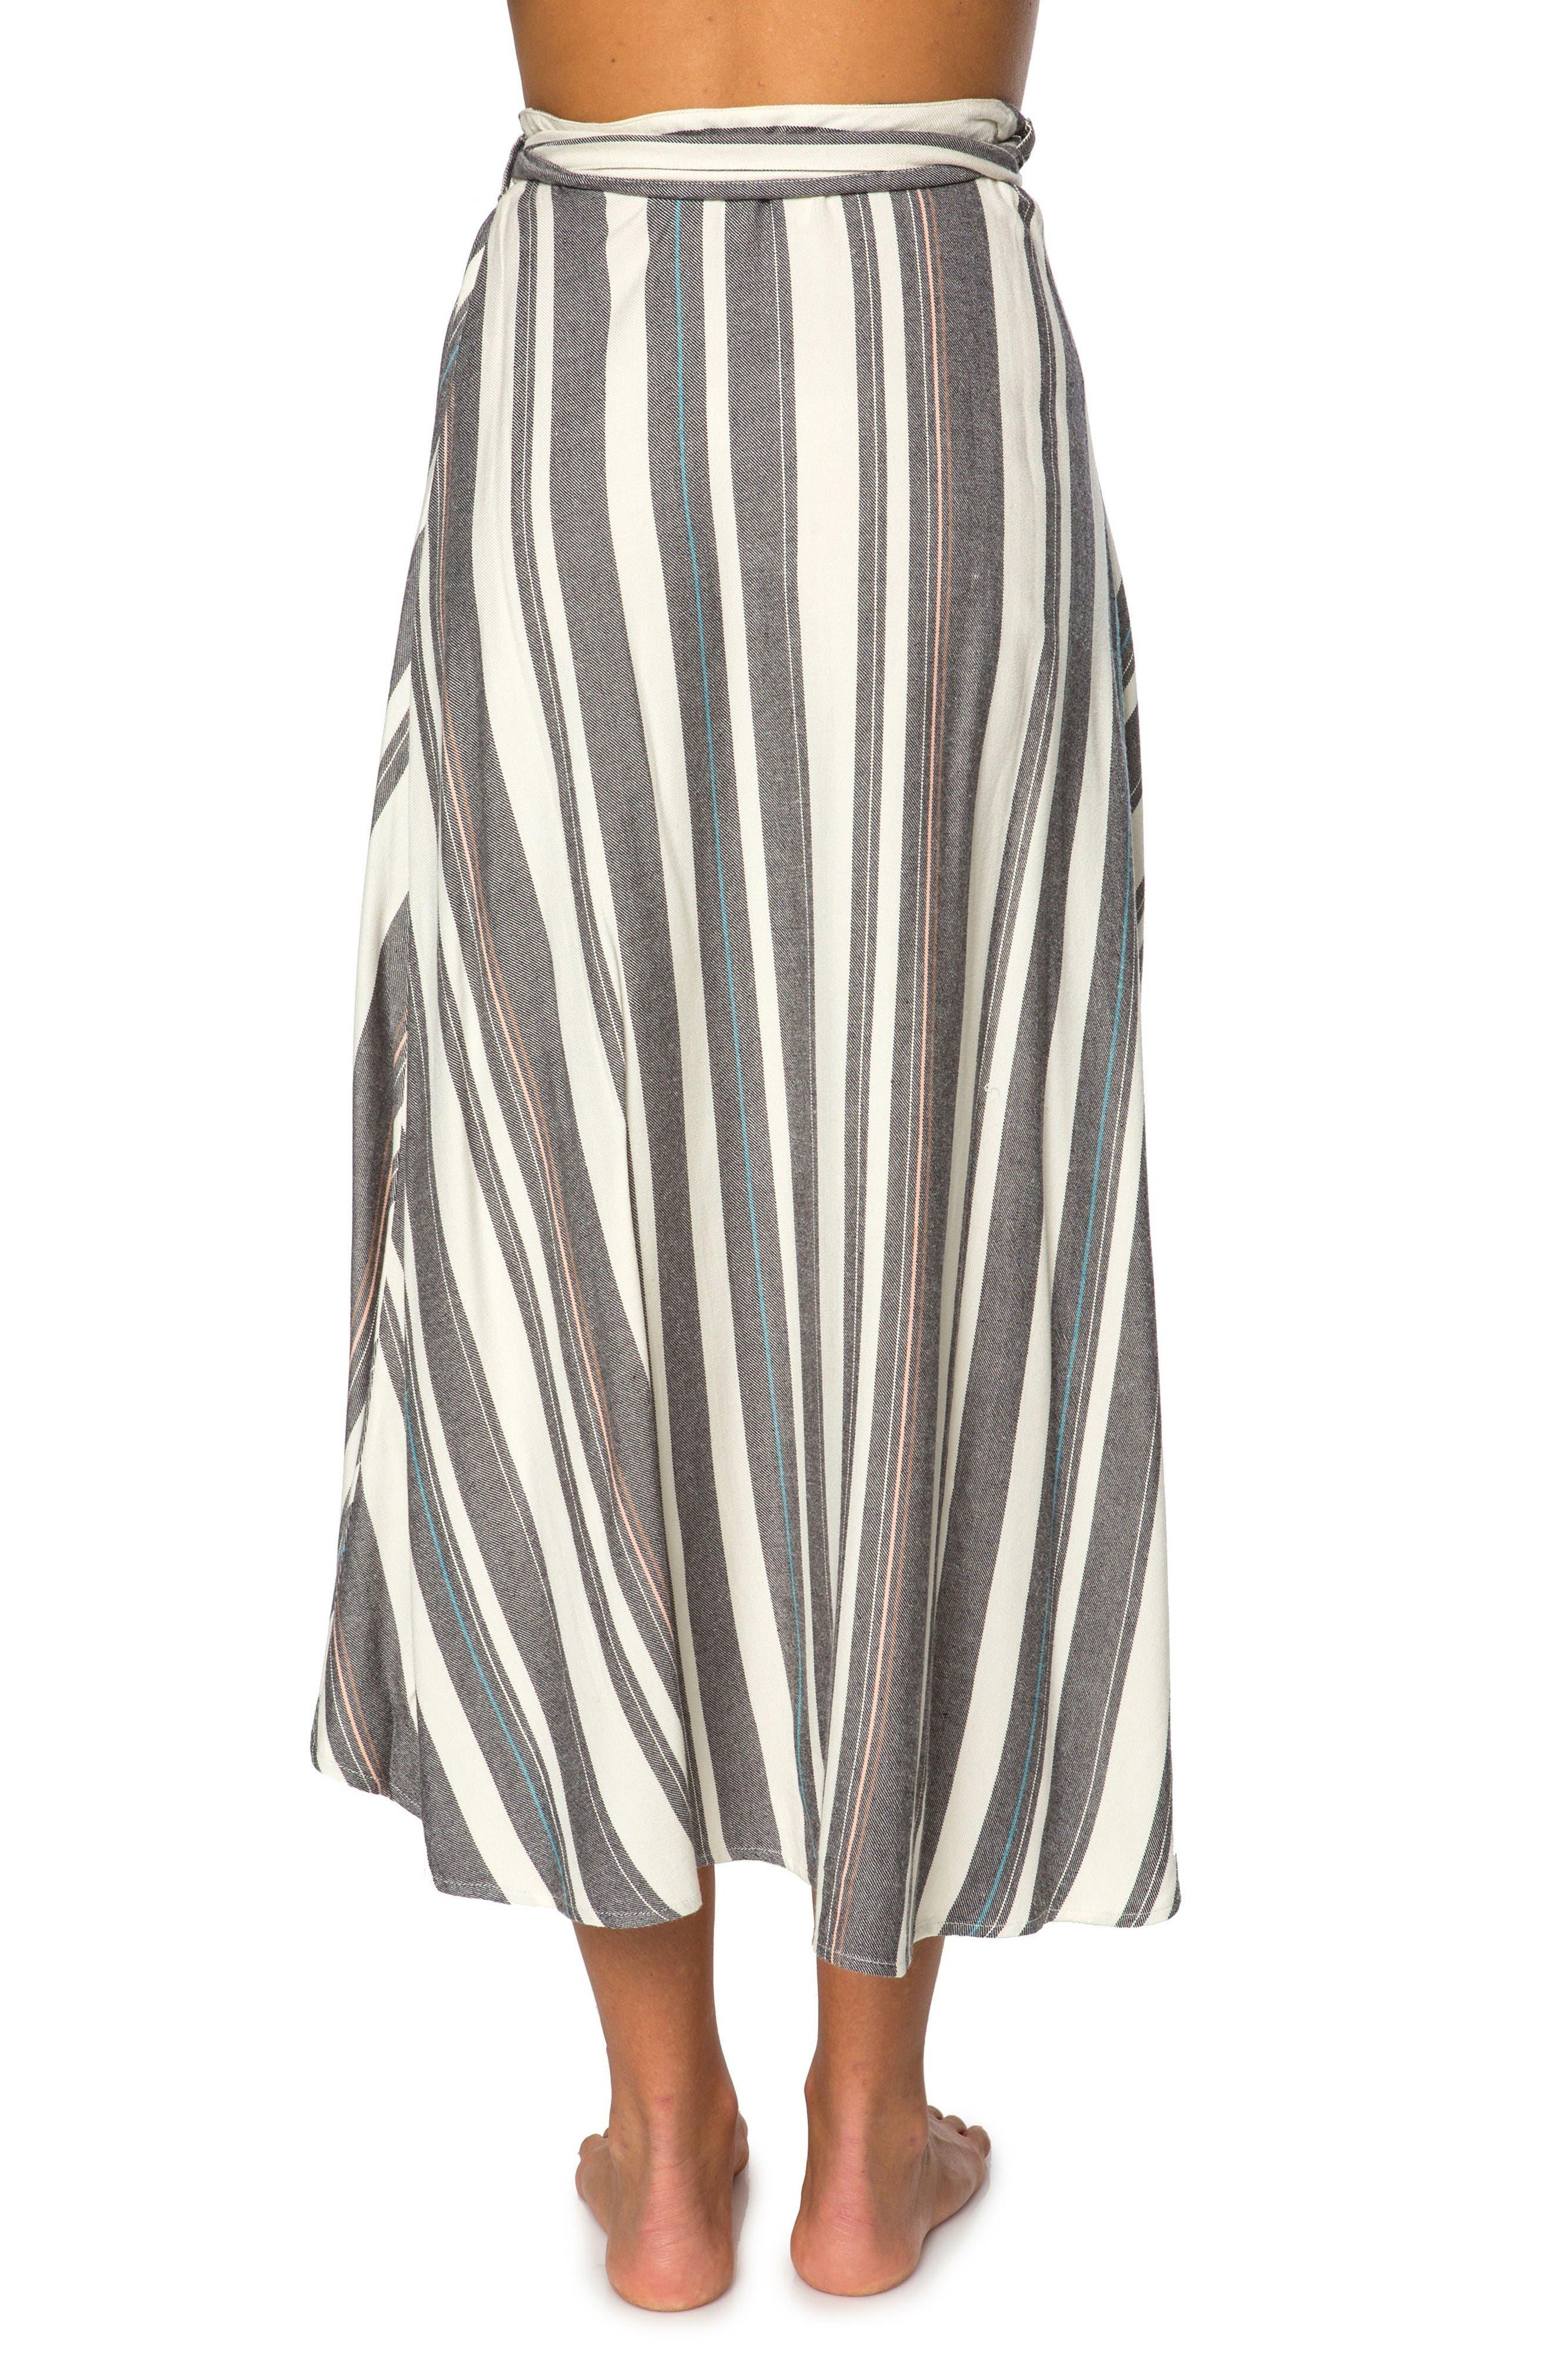 x Natalie Off Duty Savi Woven Skirt,                             Alternate thumbnail 2, color,                             Multi Color